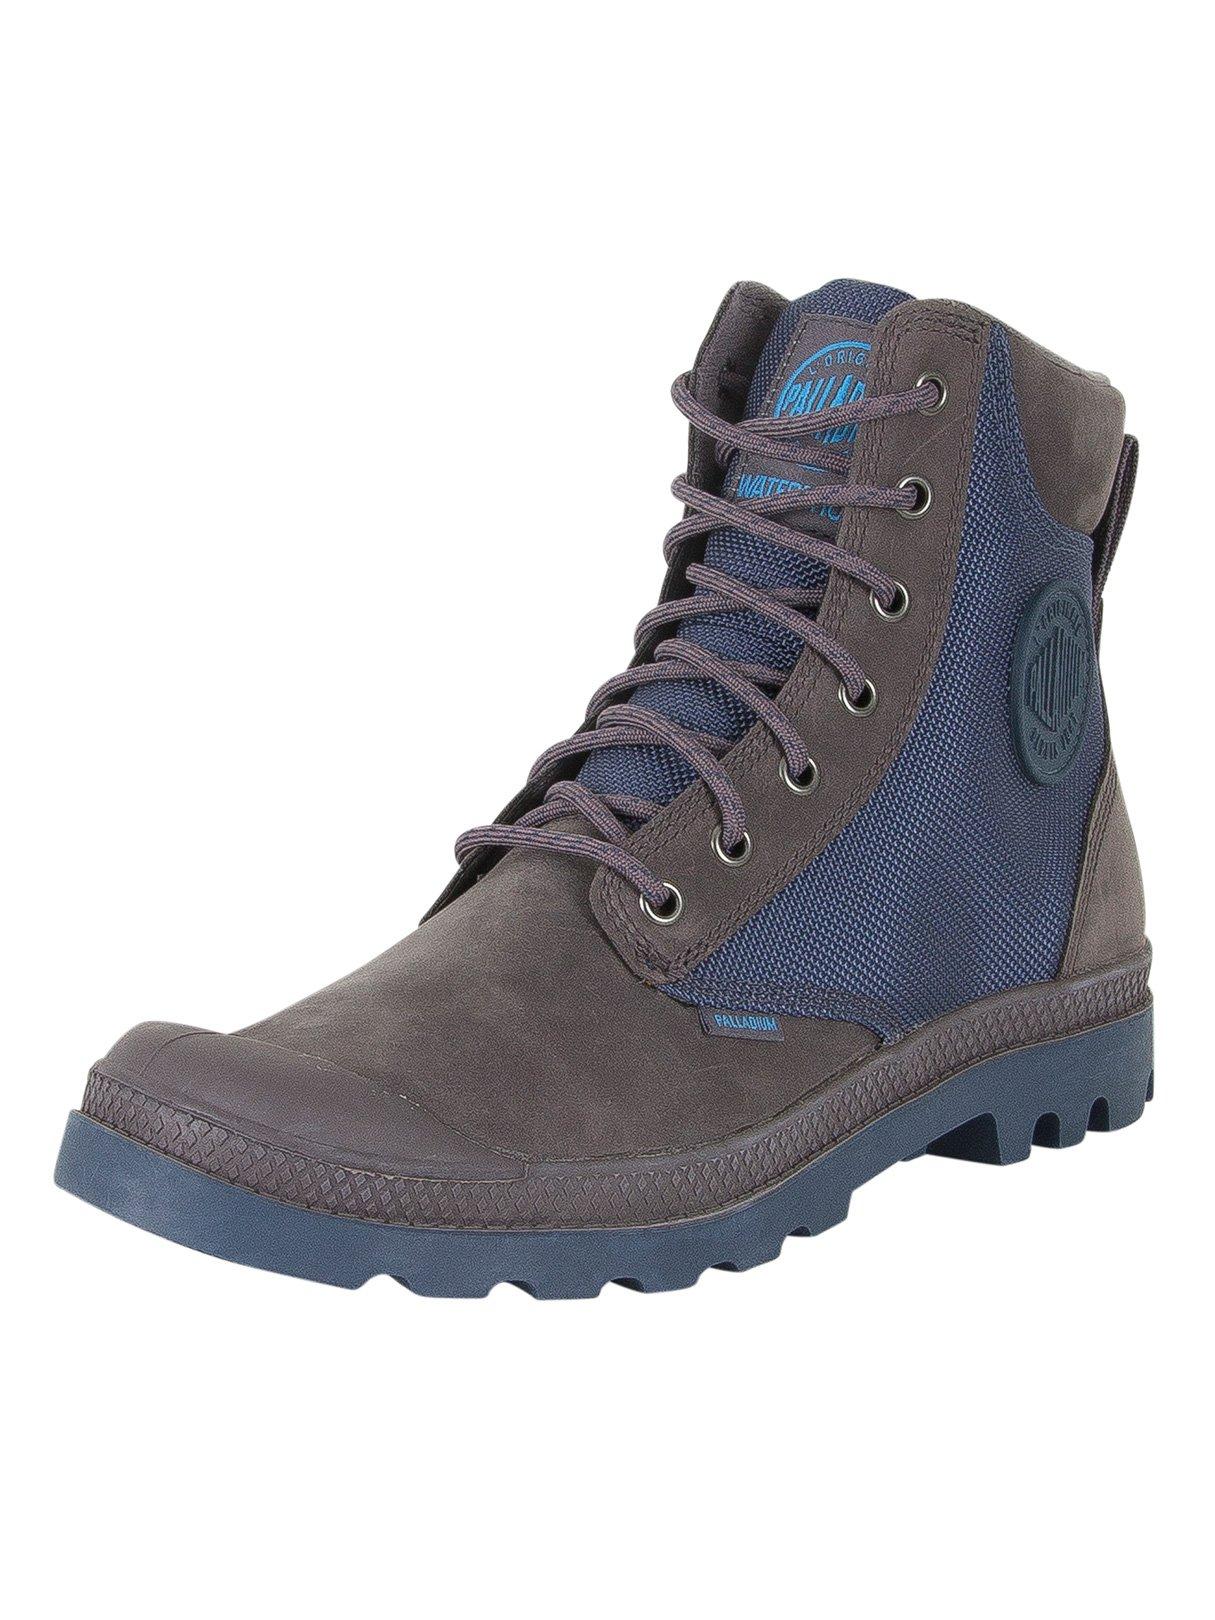 Palladium Men's Pampa Sport Cuff WPN Boots, Grey, 11.5 US